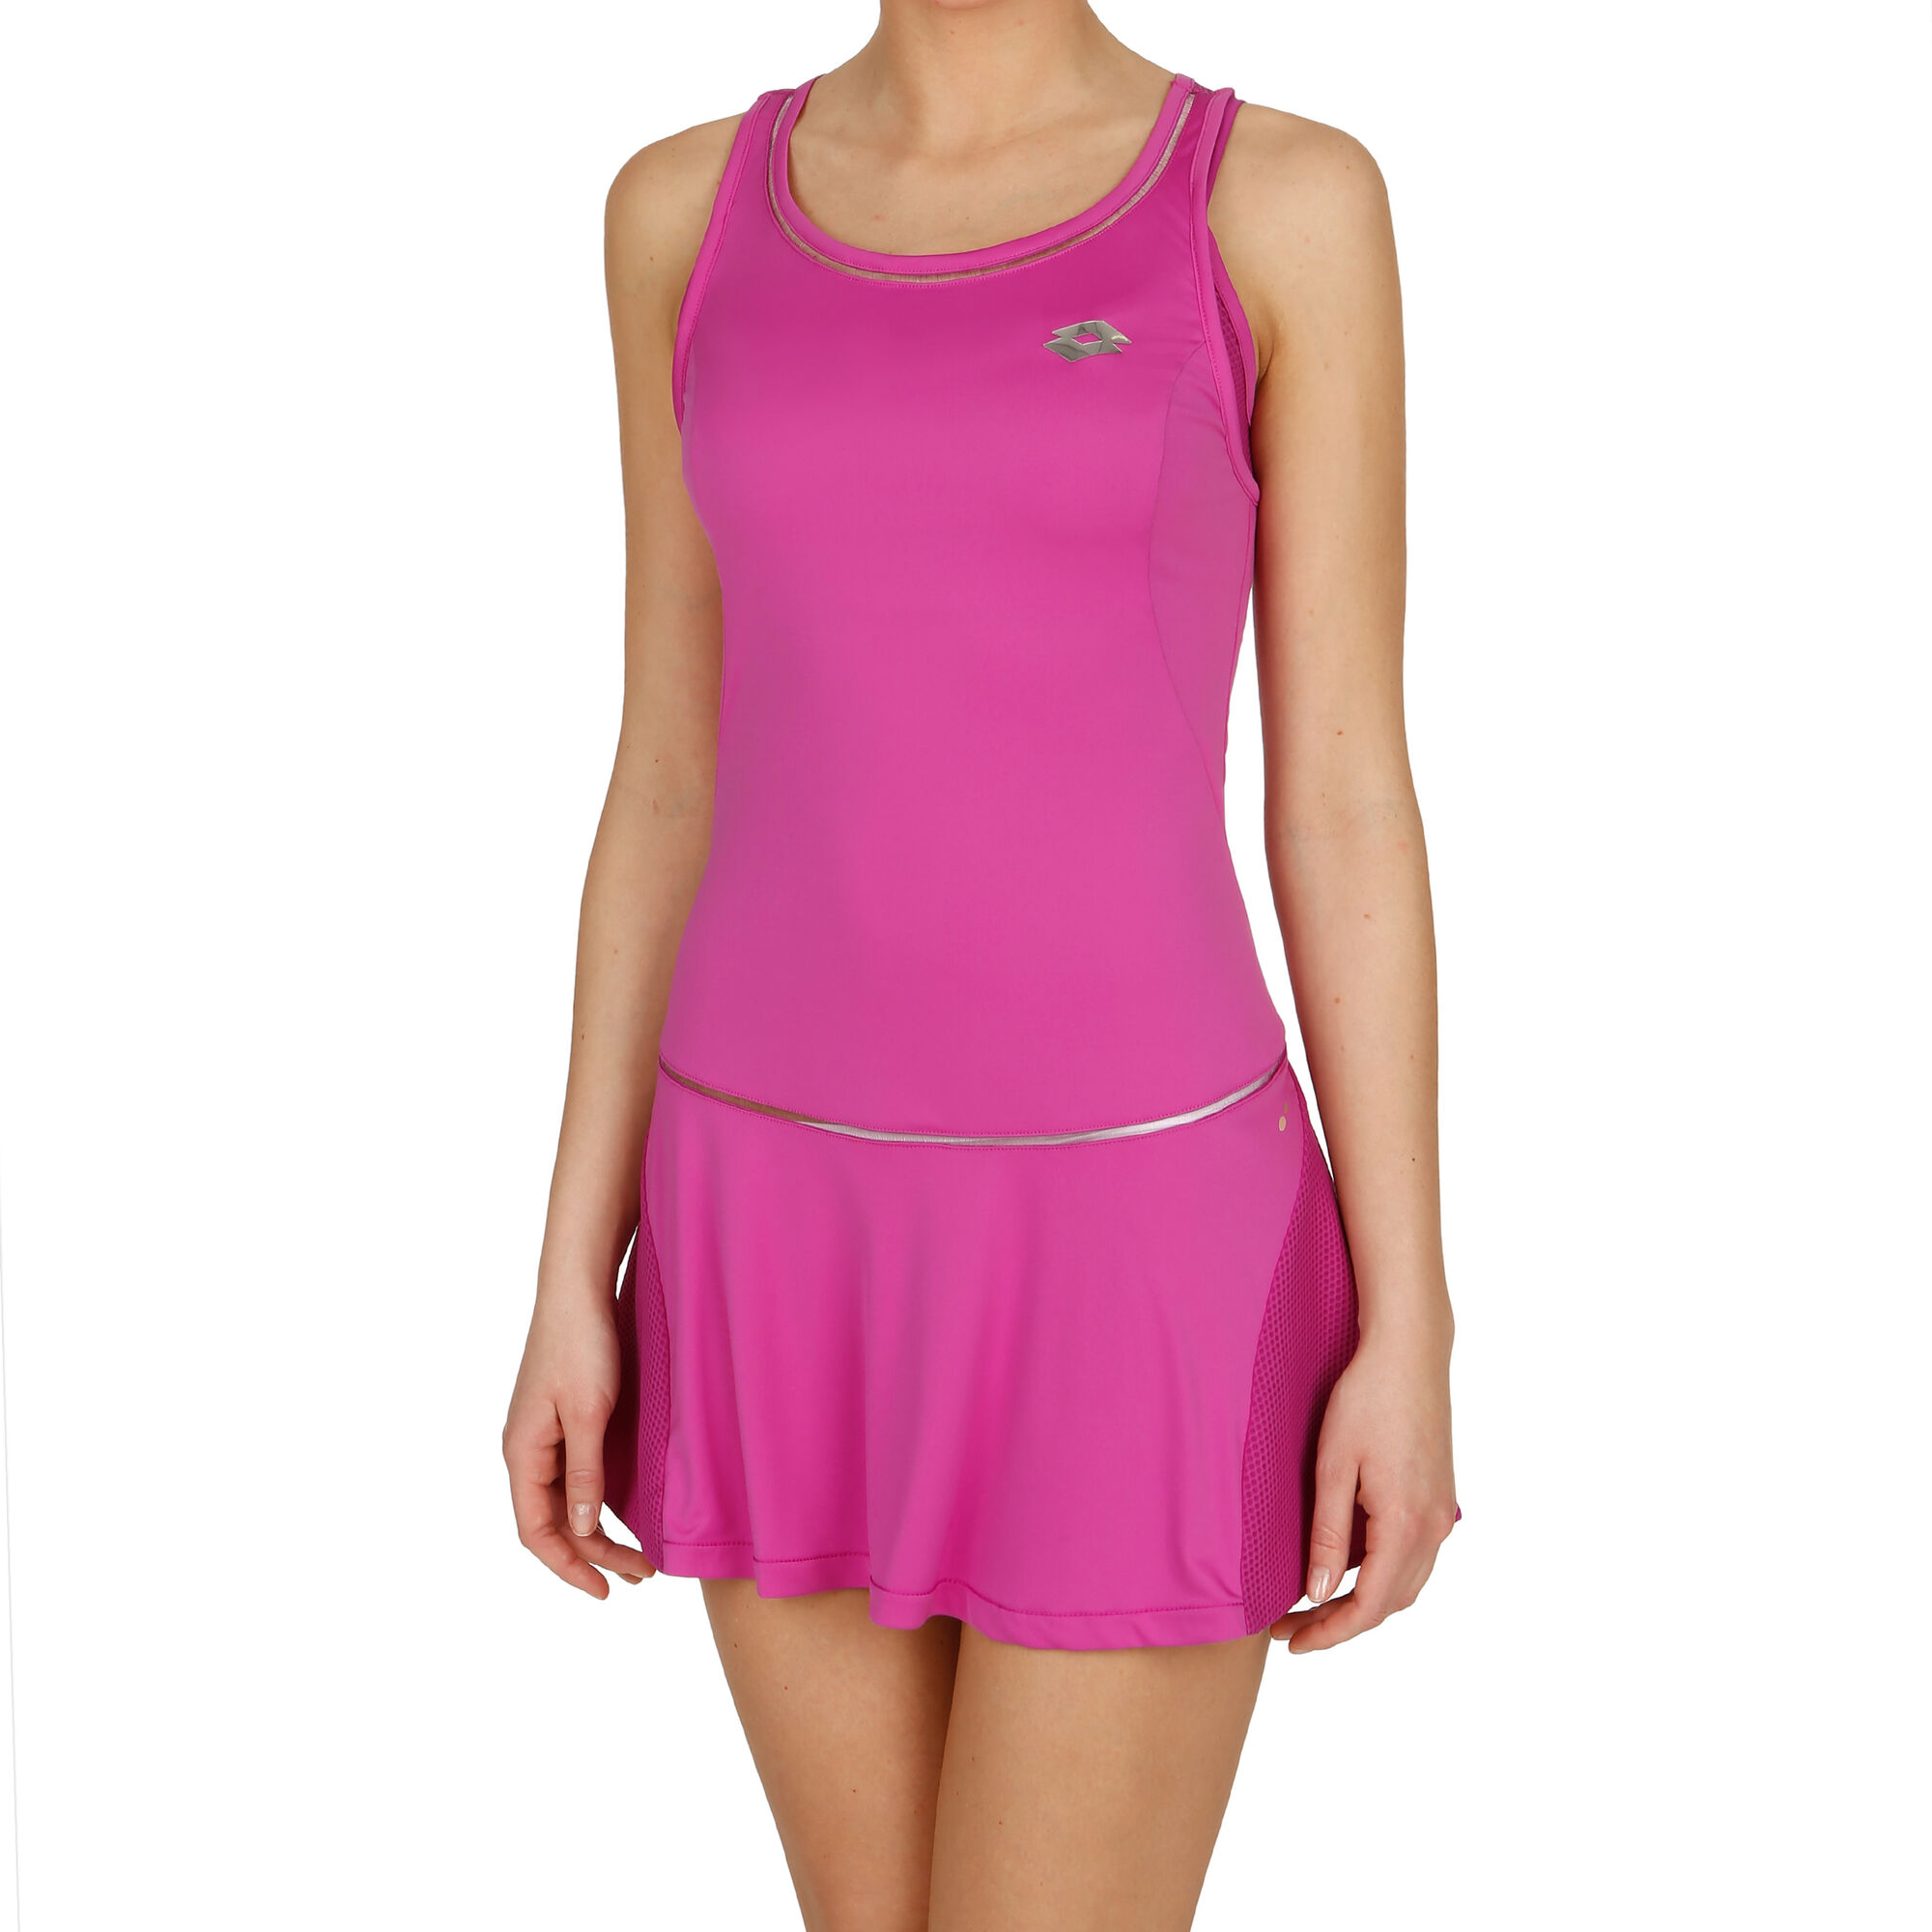 Lotto Nixia III Kleid Damen - Pink, Silber online kaufen ...